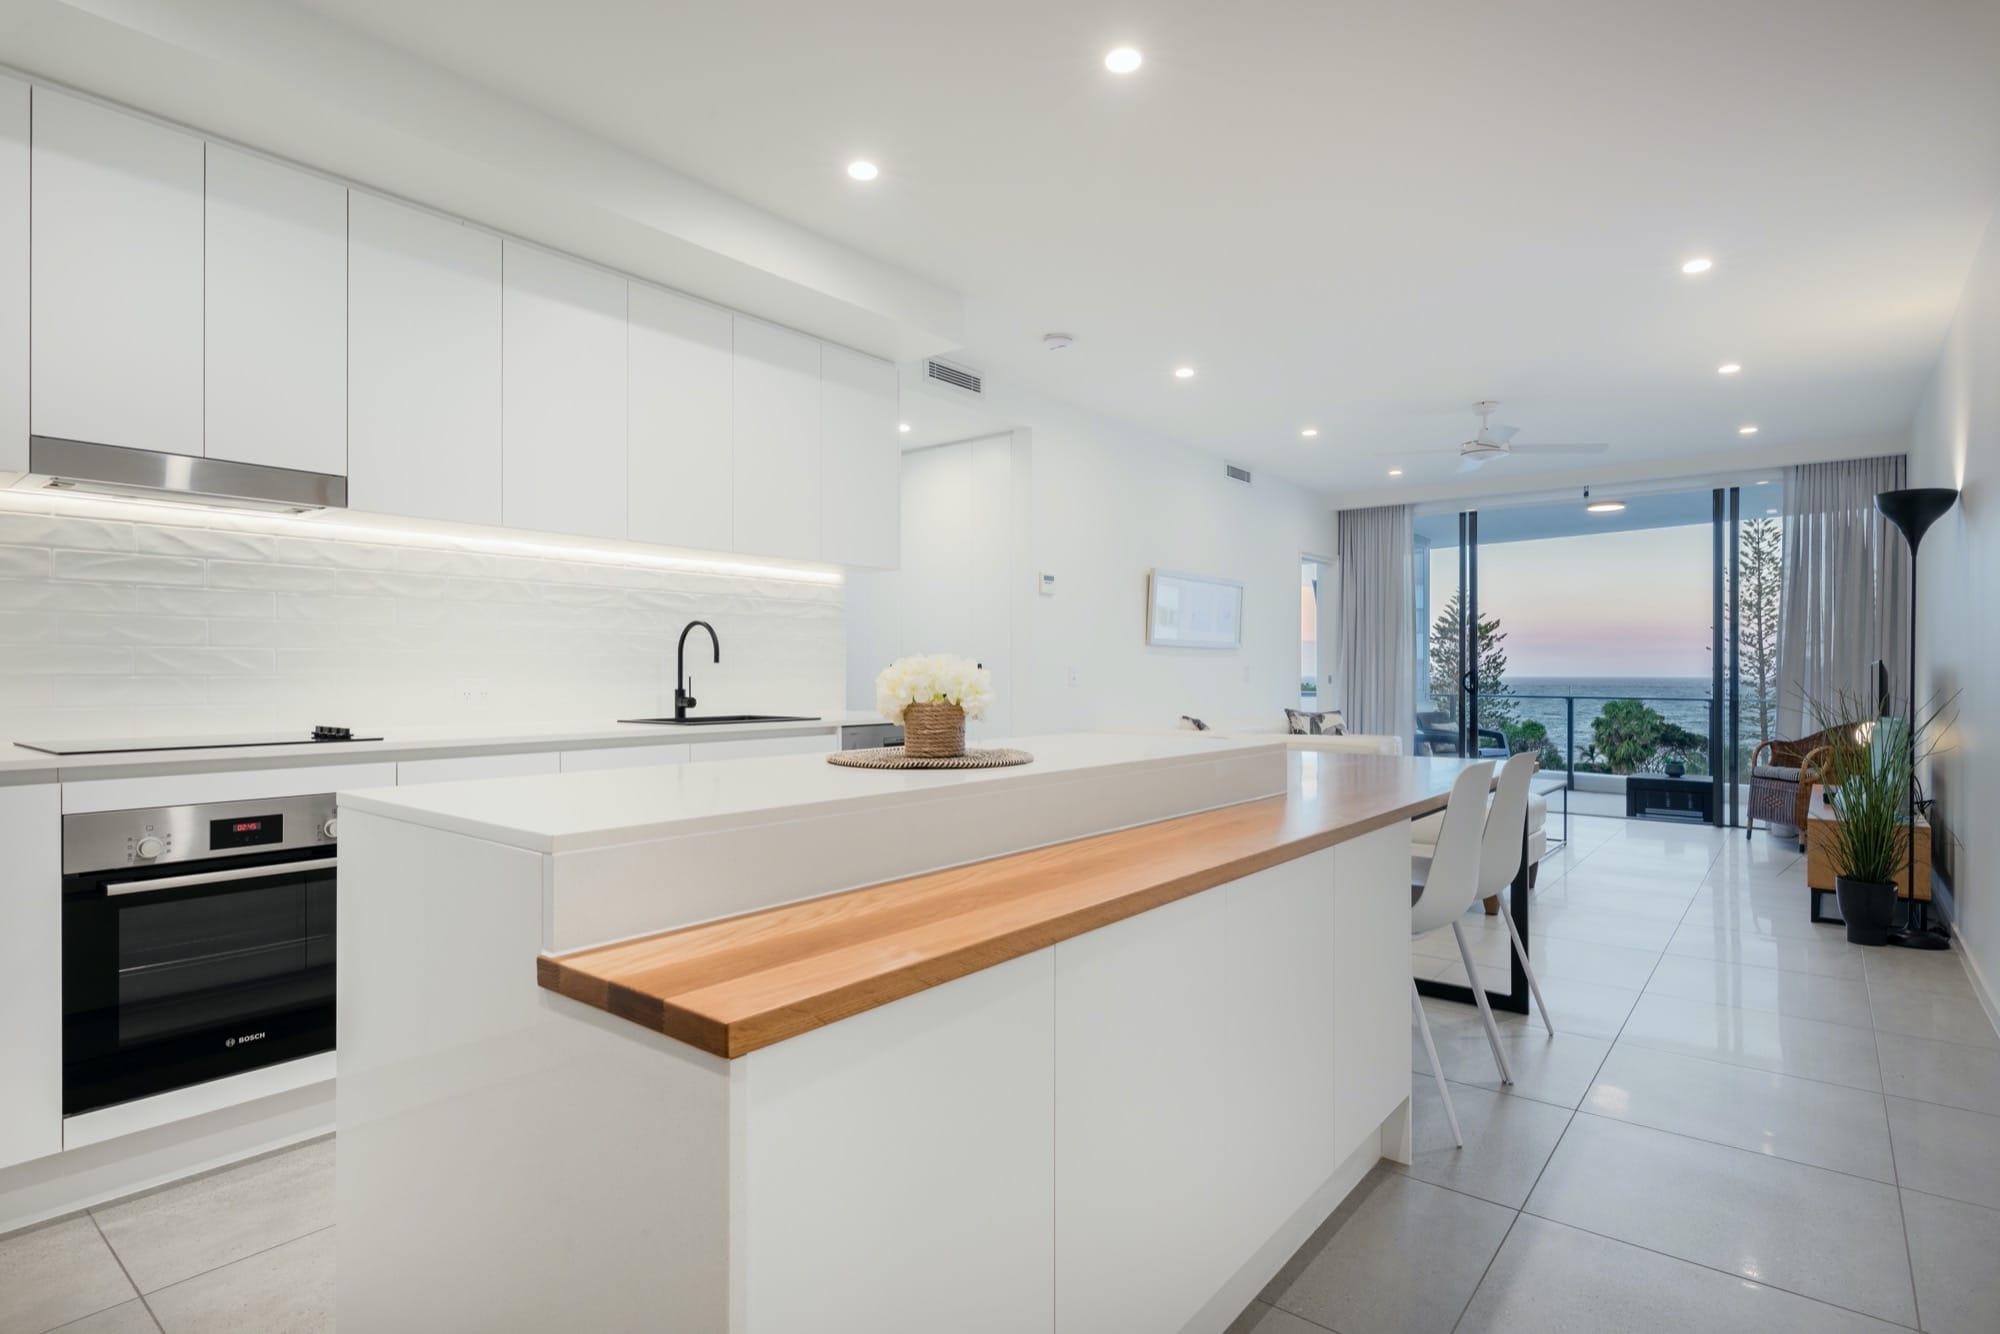 unit-501-kitchen-dining-living